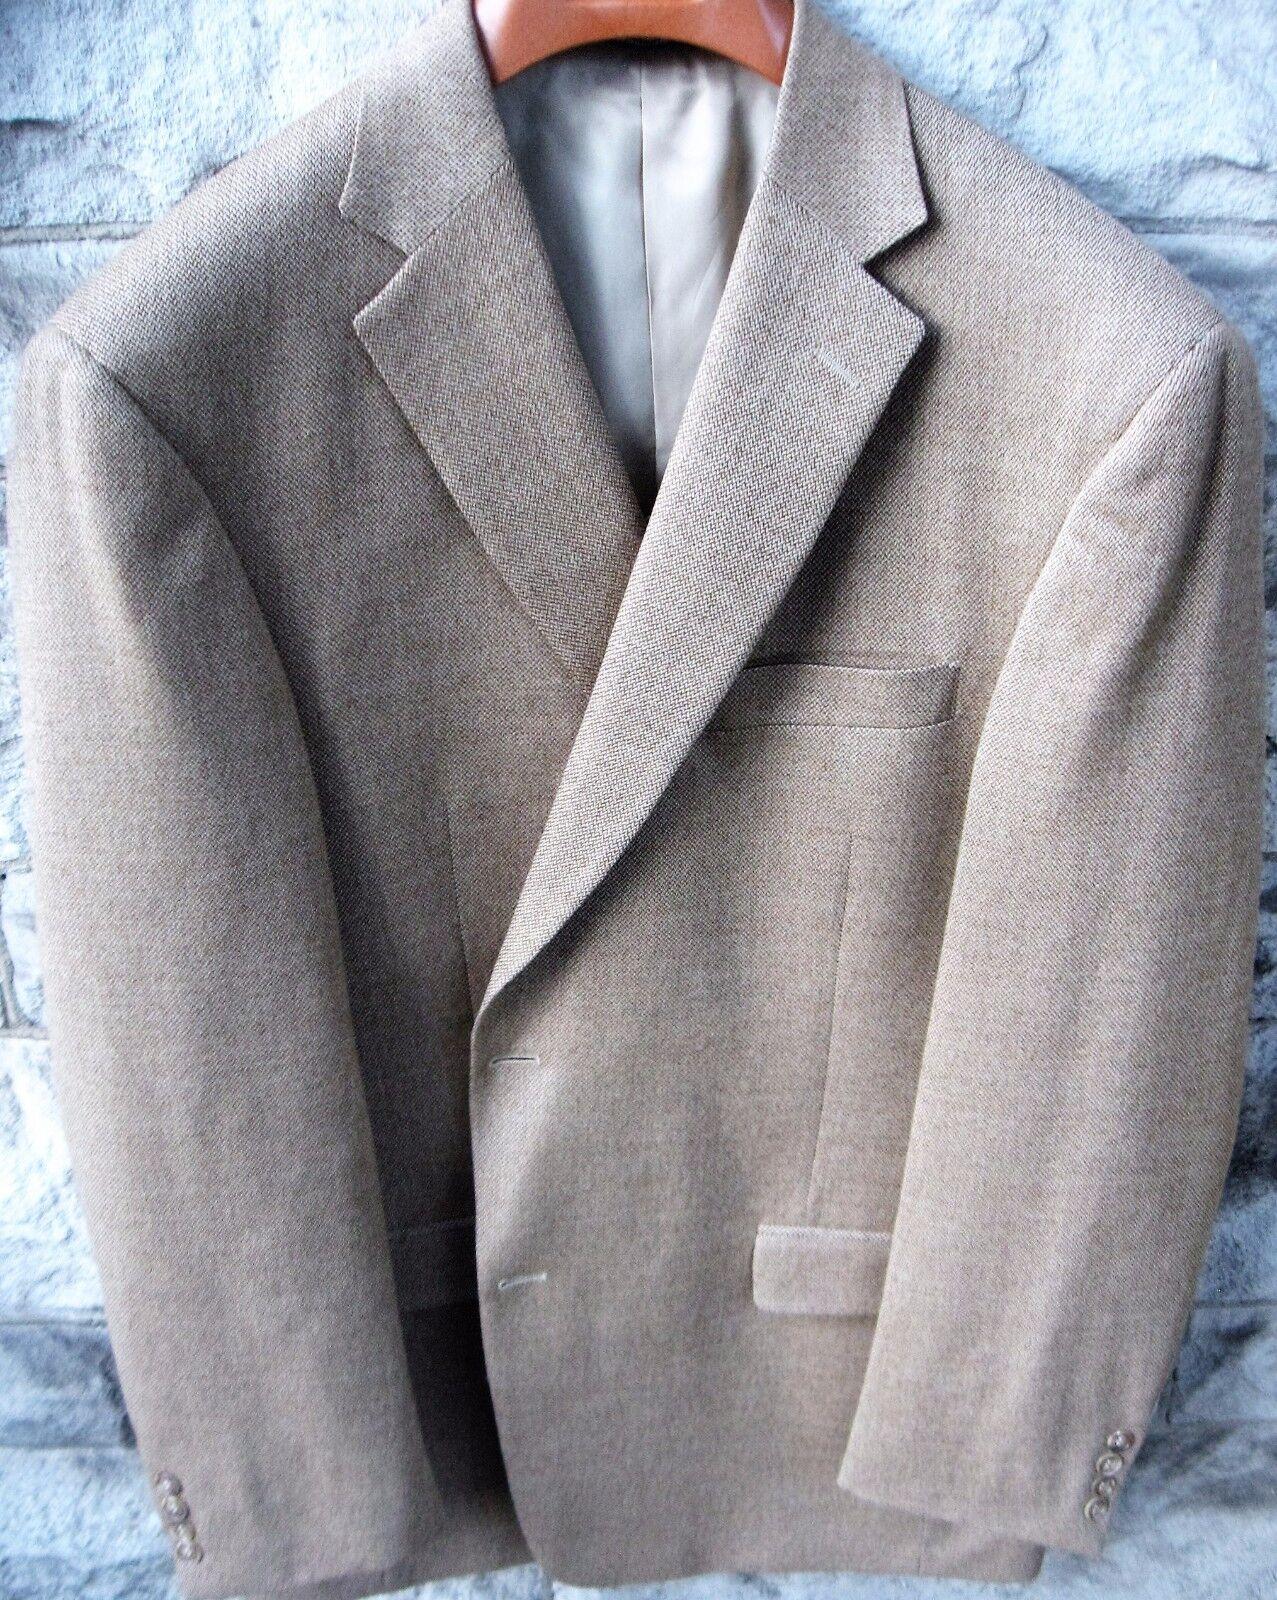 Hart, Scaffner & Marx men's sports coat size 46 L